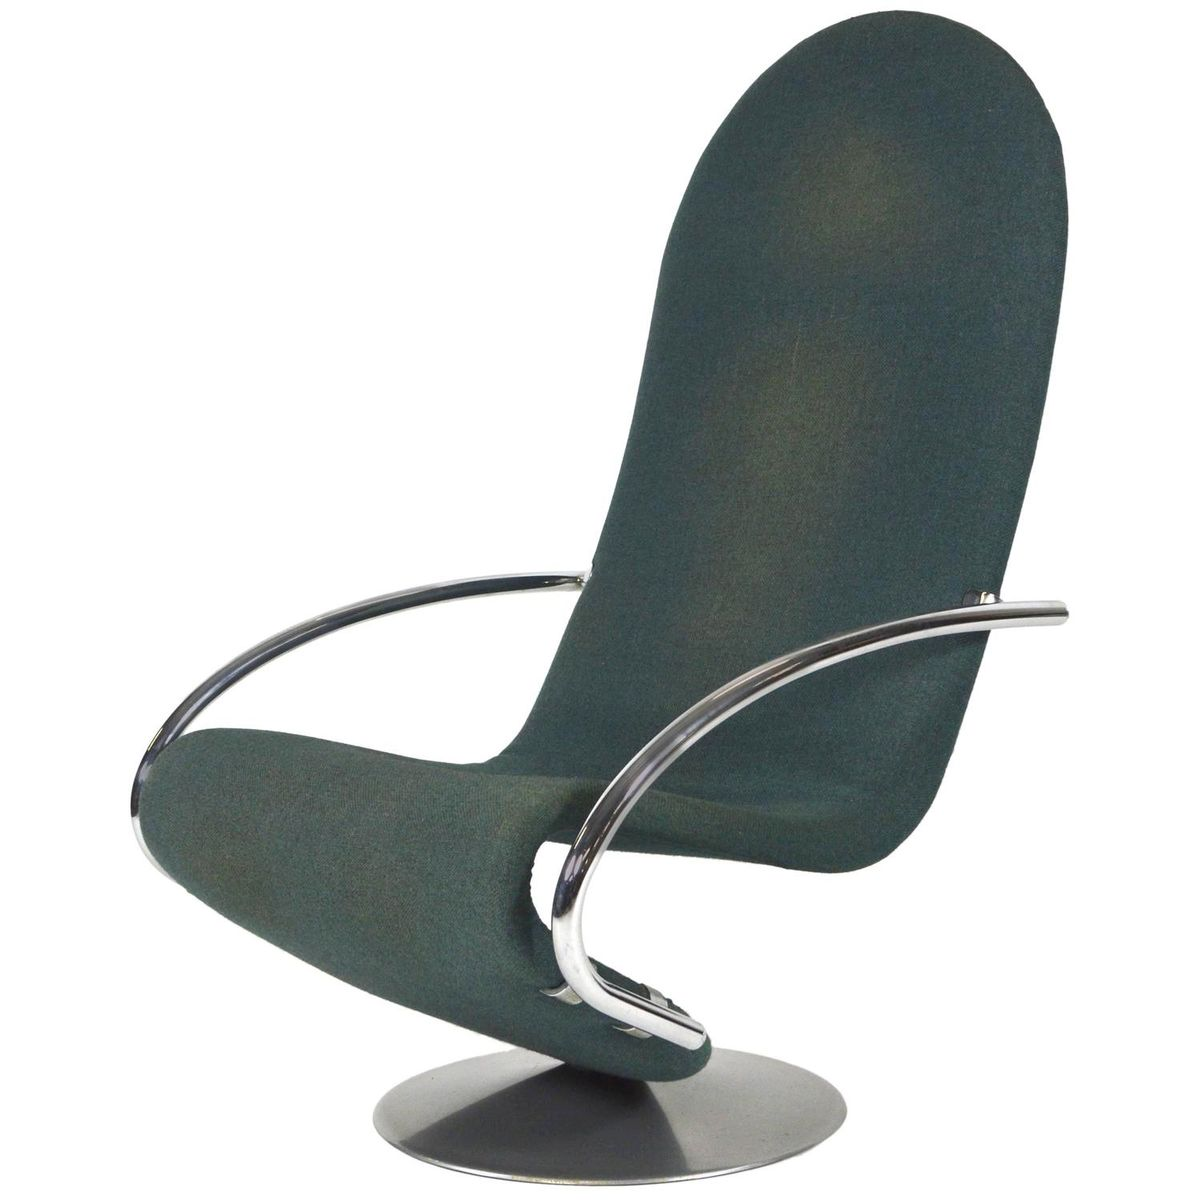 Danish 1 2 3 Swivel Lounge Chair By Verner Panton For Fritz Hansen, 1970s